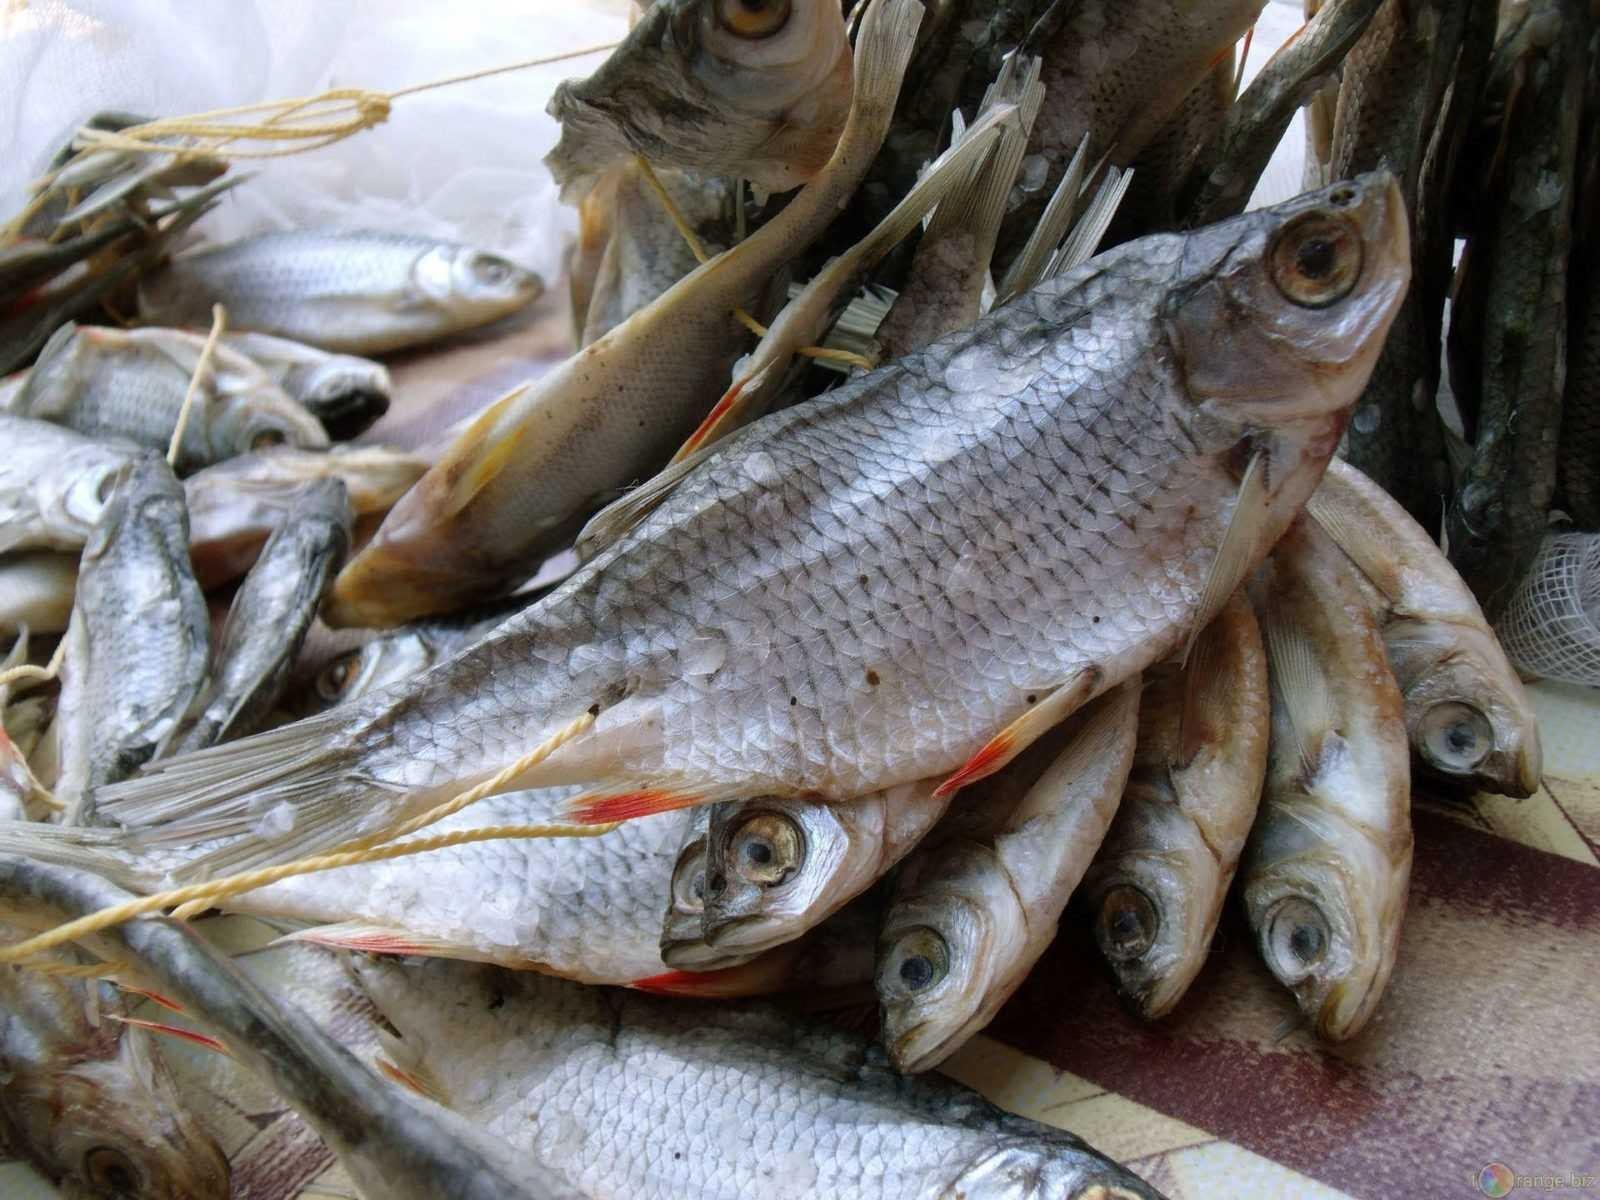 хранить вяленую рыбу можно легко в домашних условиях